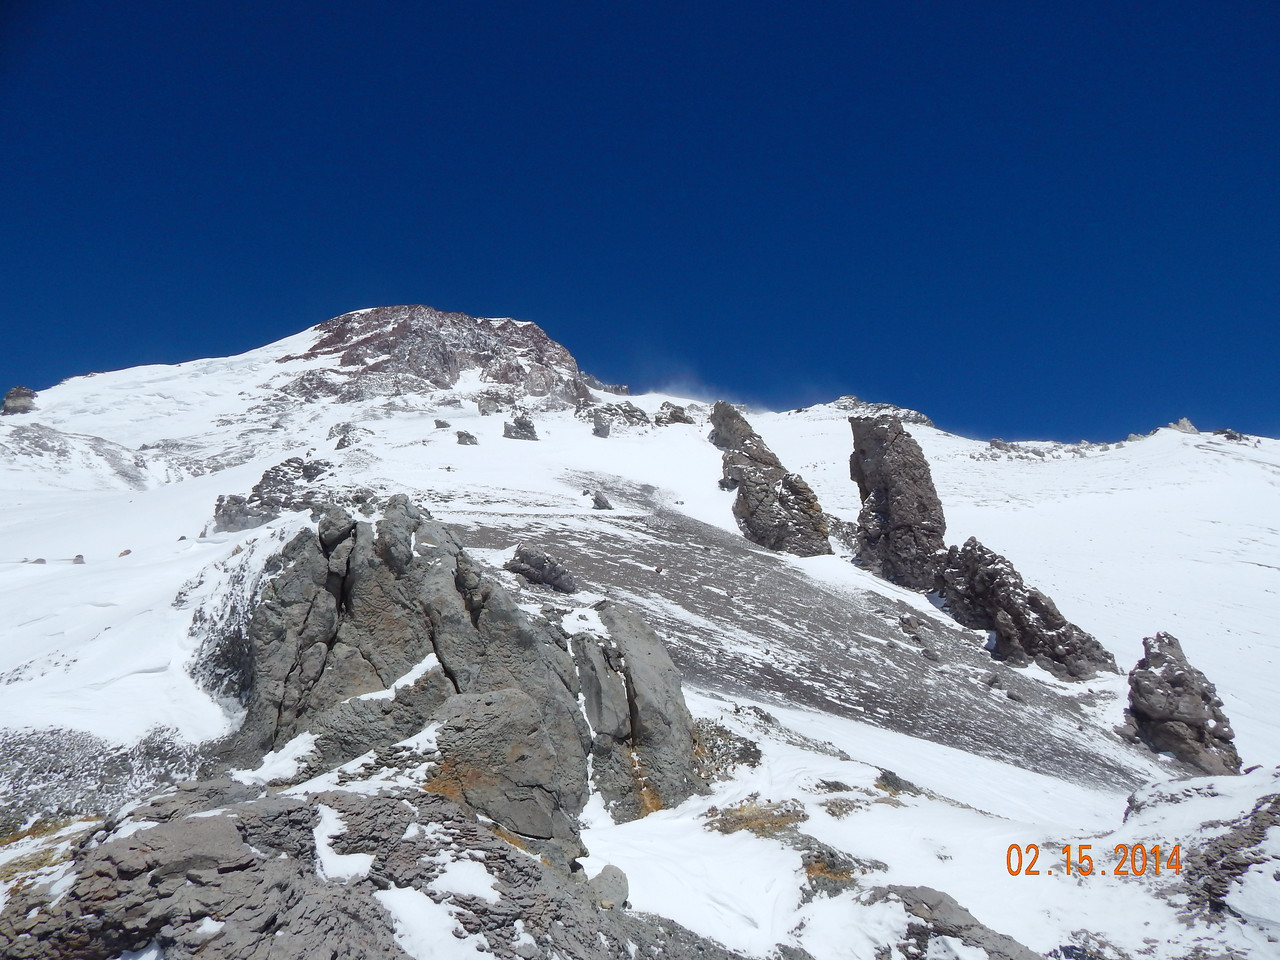 View towards Camp 3